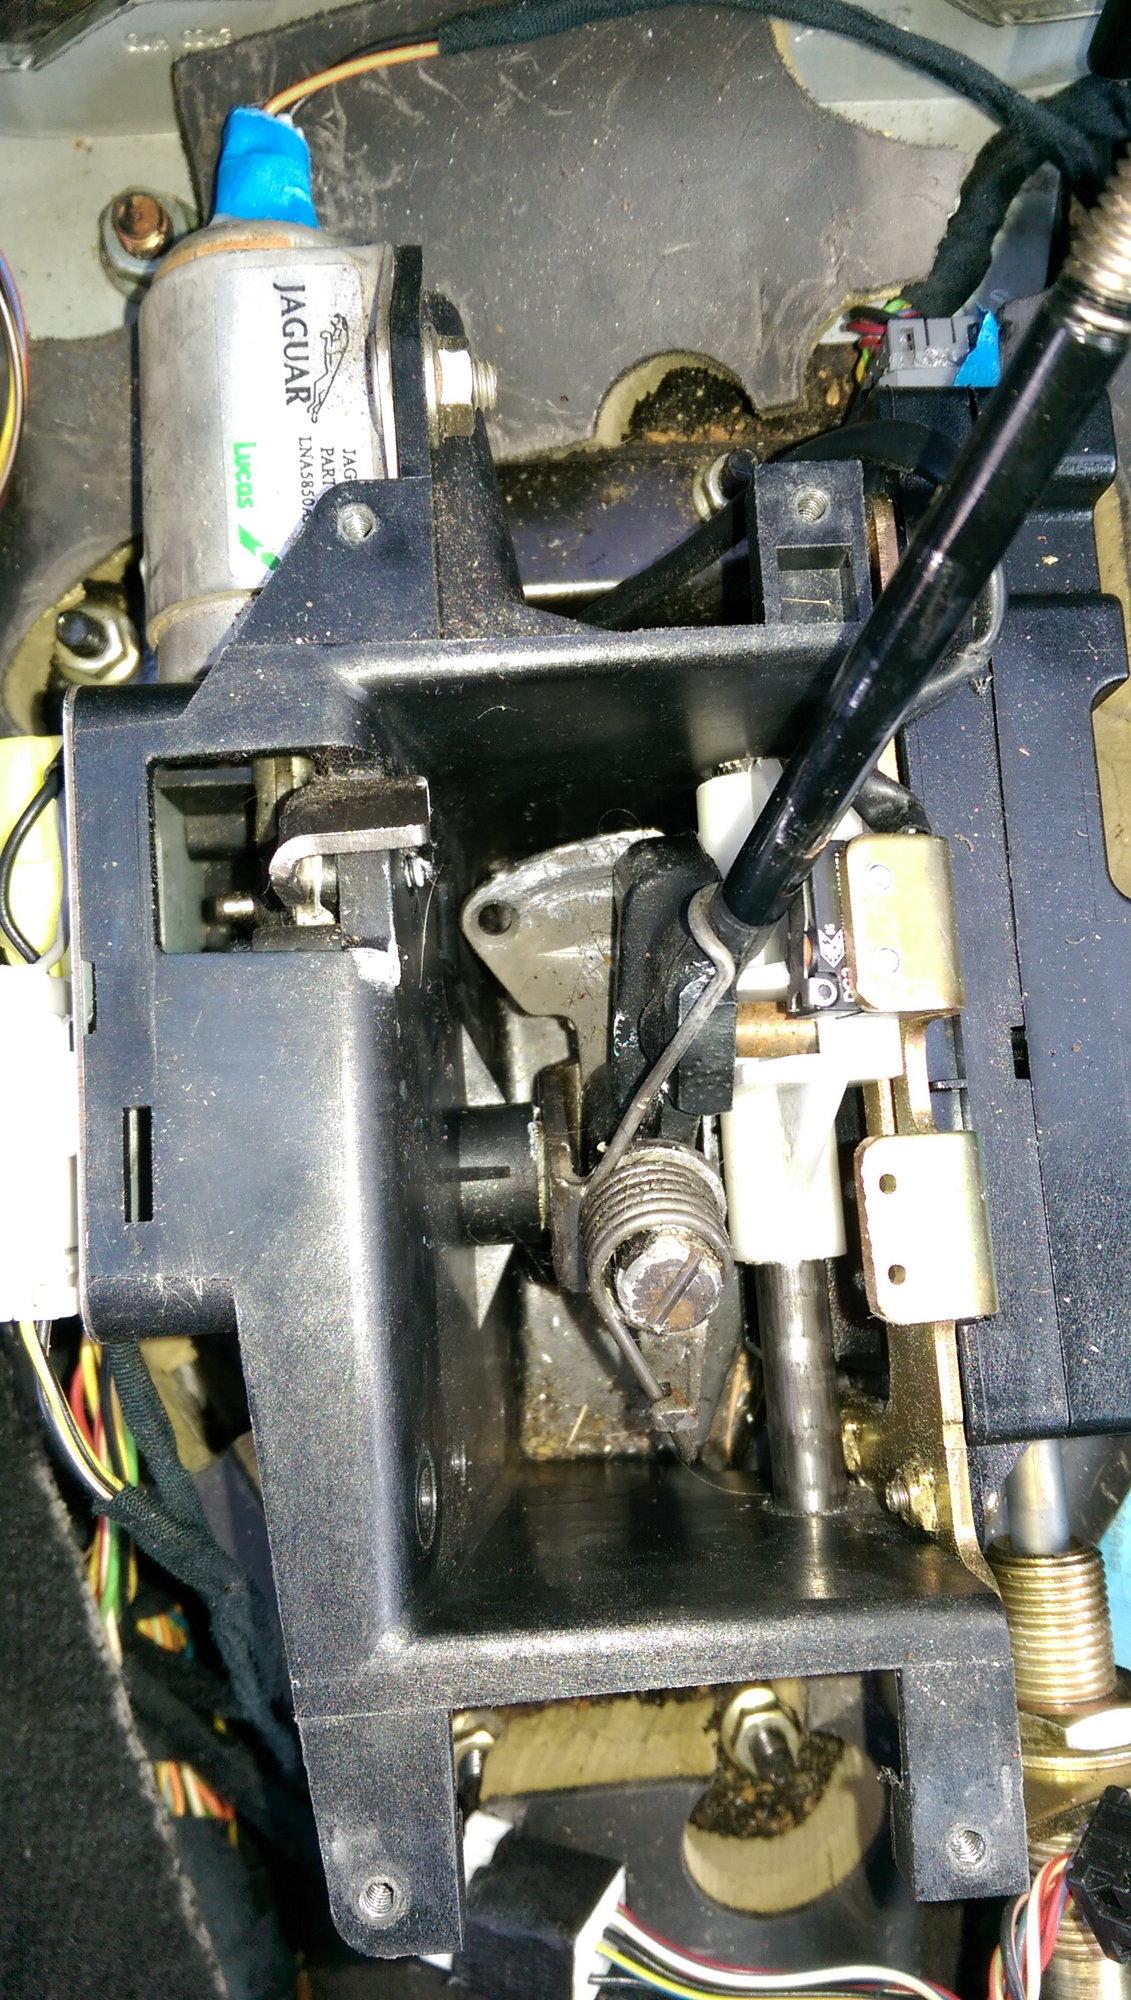 imag6197_1__e301f7146ca2c33f67146ddc590a48e8a3cd2a01  Jaguar Wiring Harness on diagram for fender, electric fan,